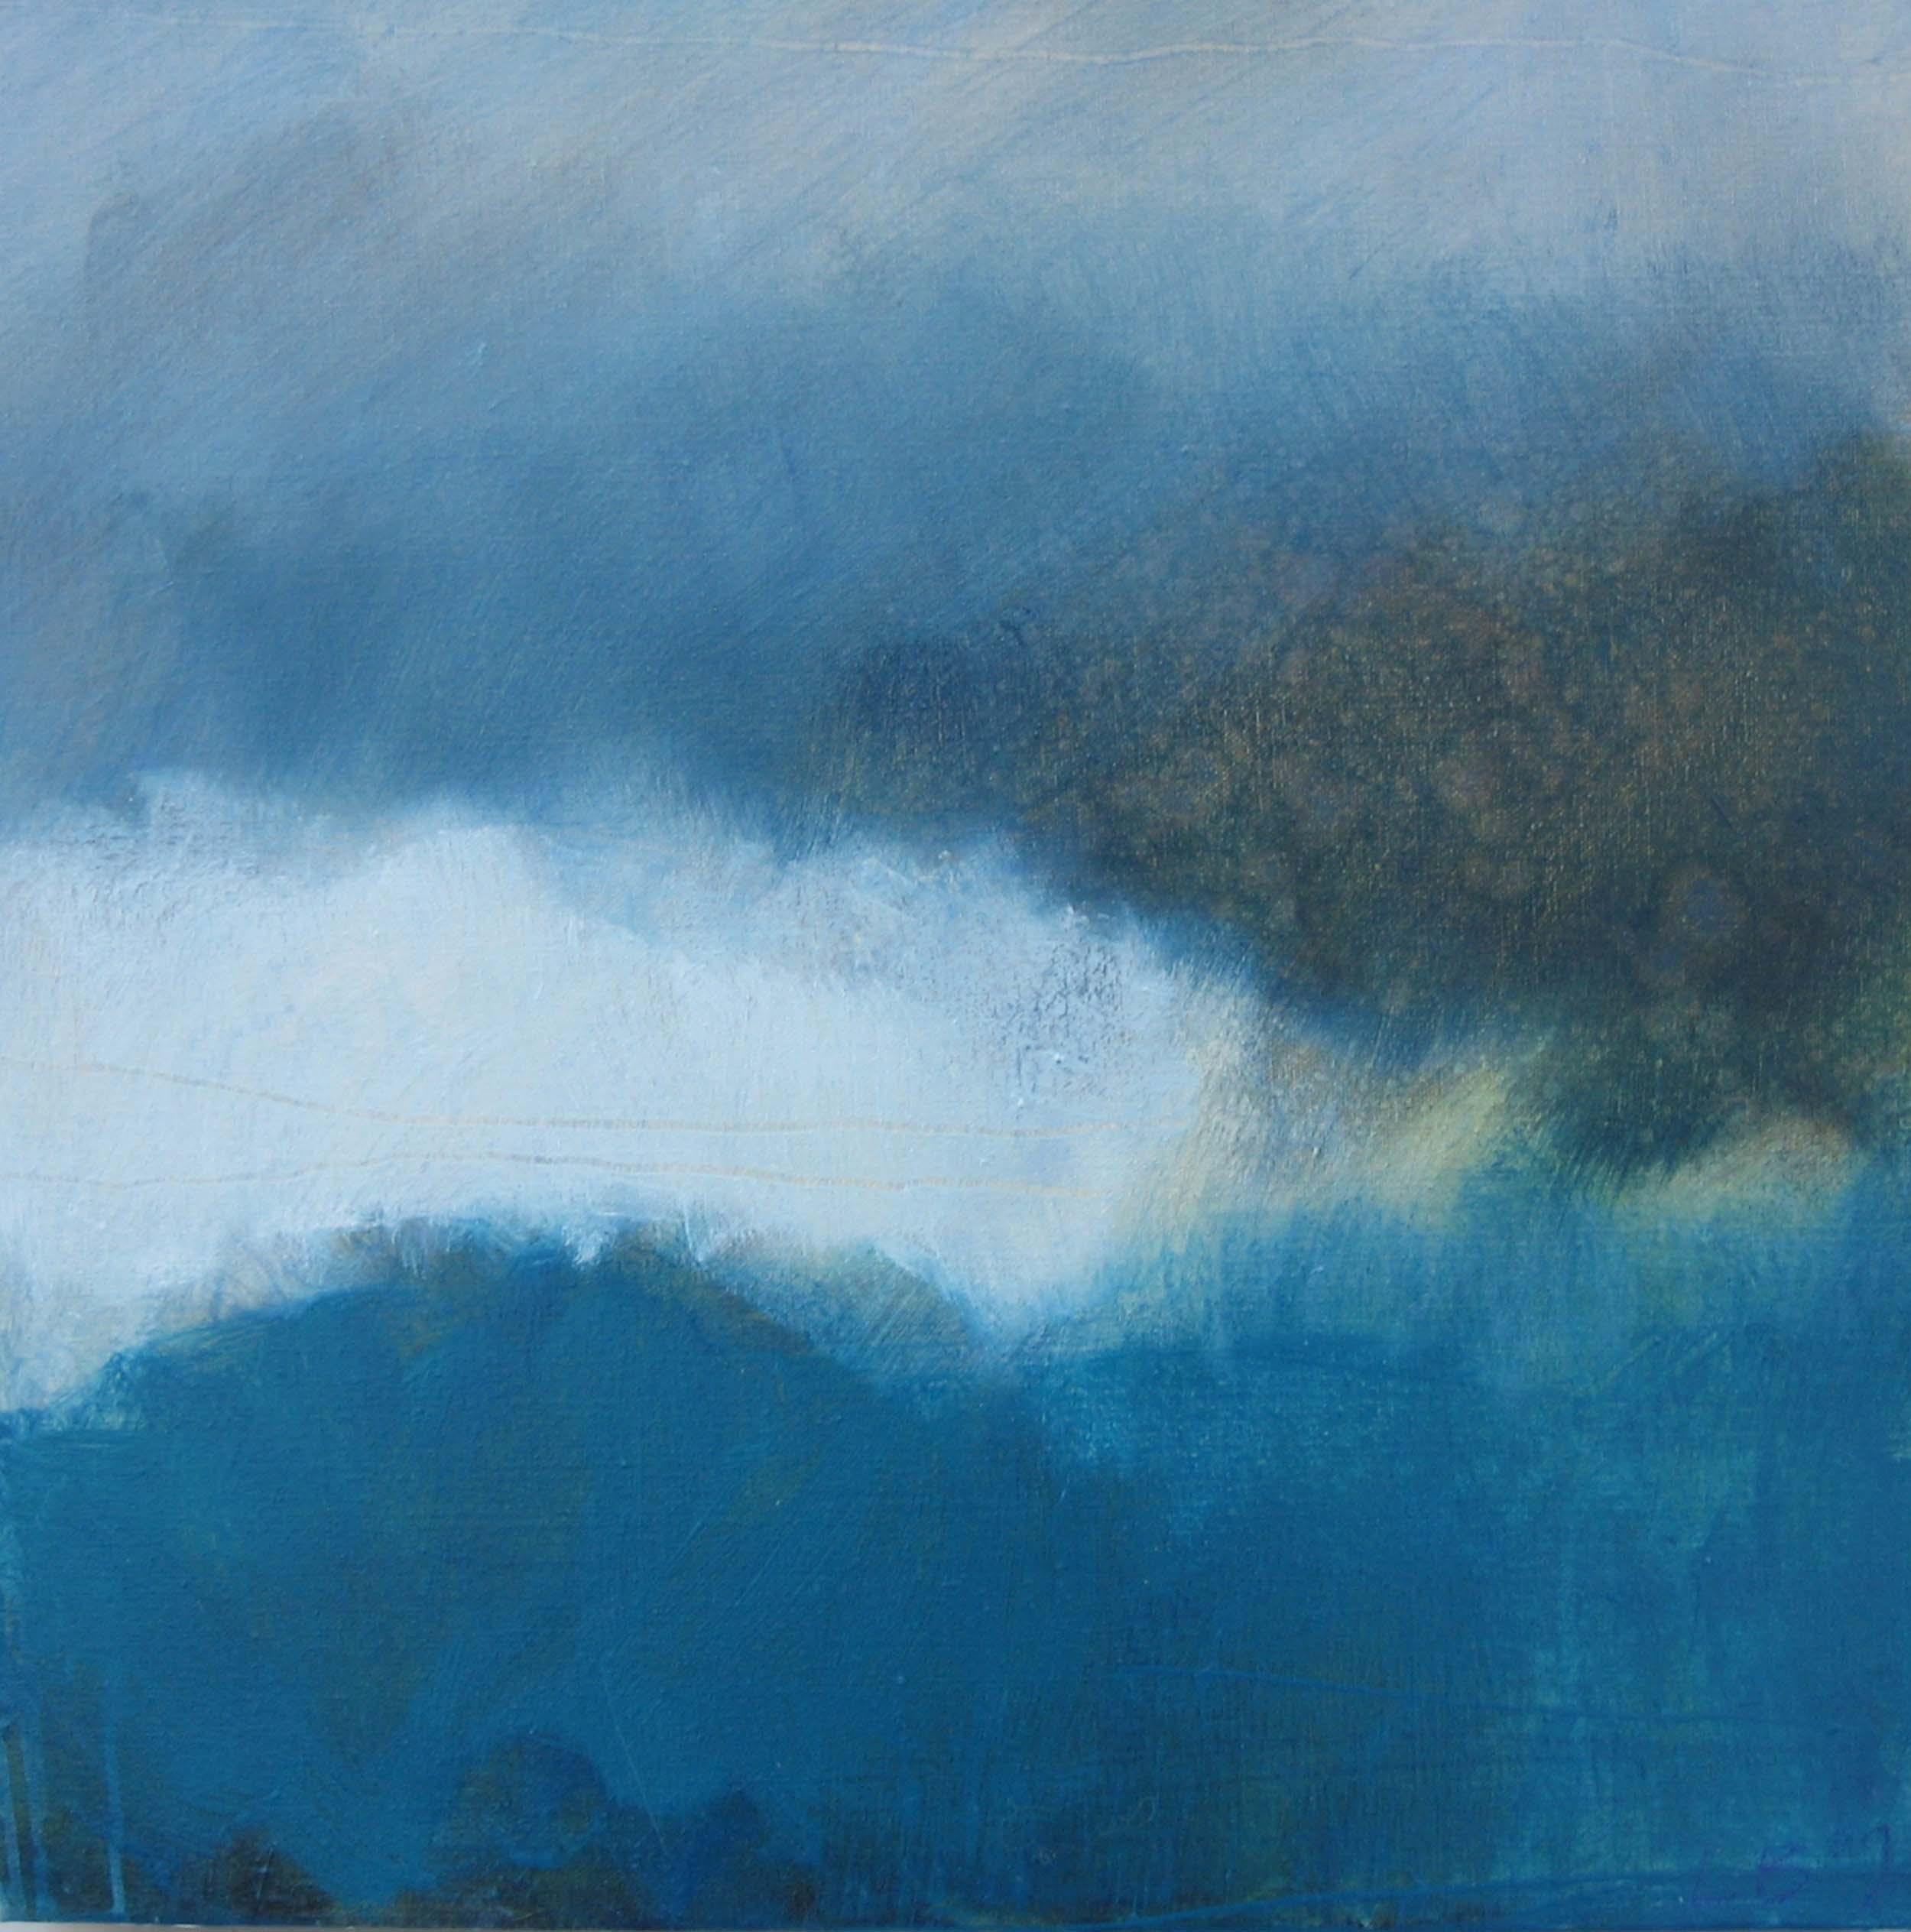 Leah Beggs 2009  Connemara Blues II- Oil on Canvas  - 41 x 41 cm_sml.jpg